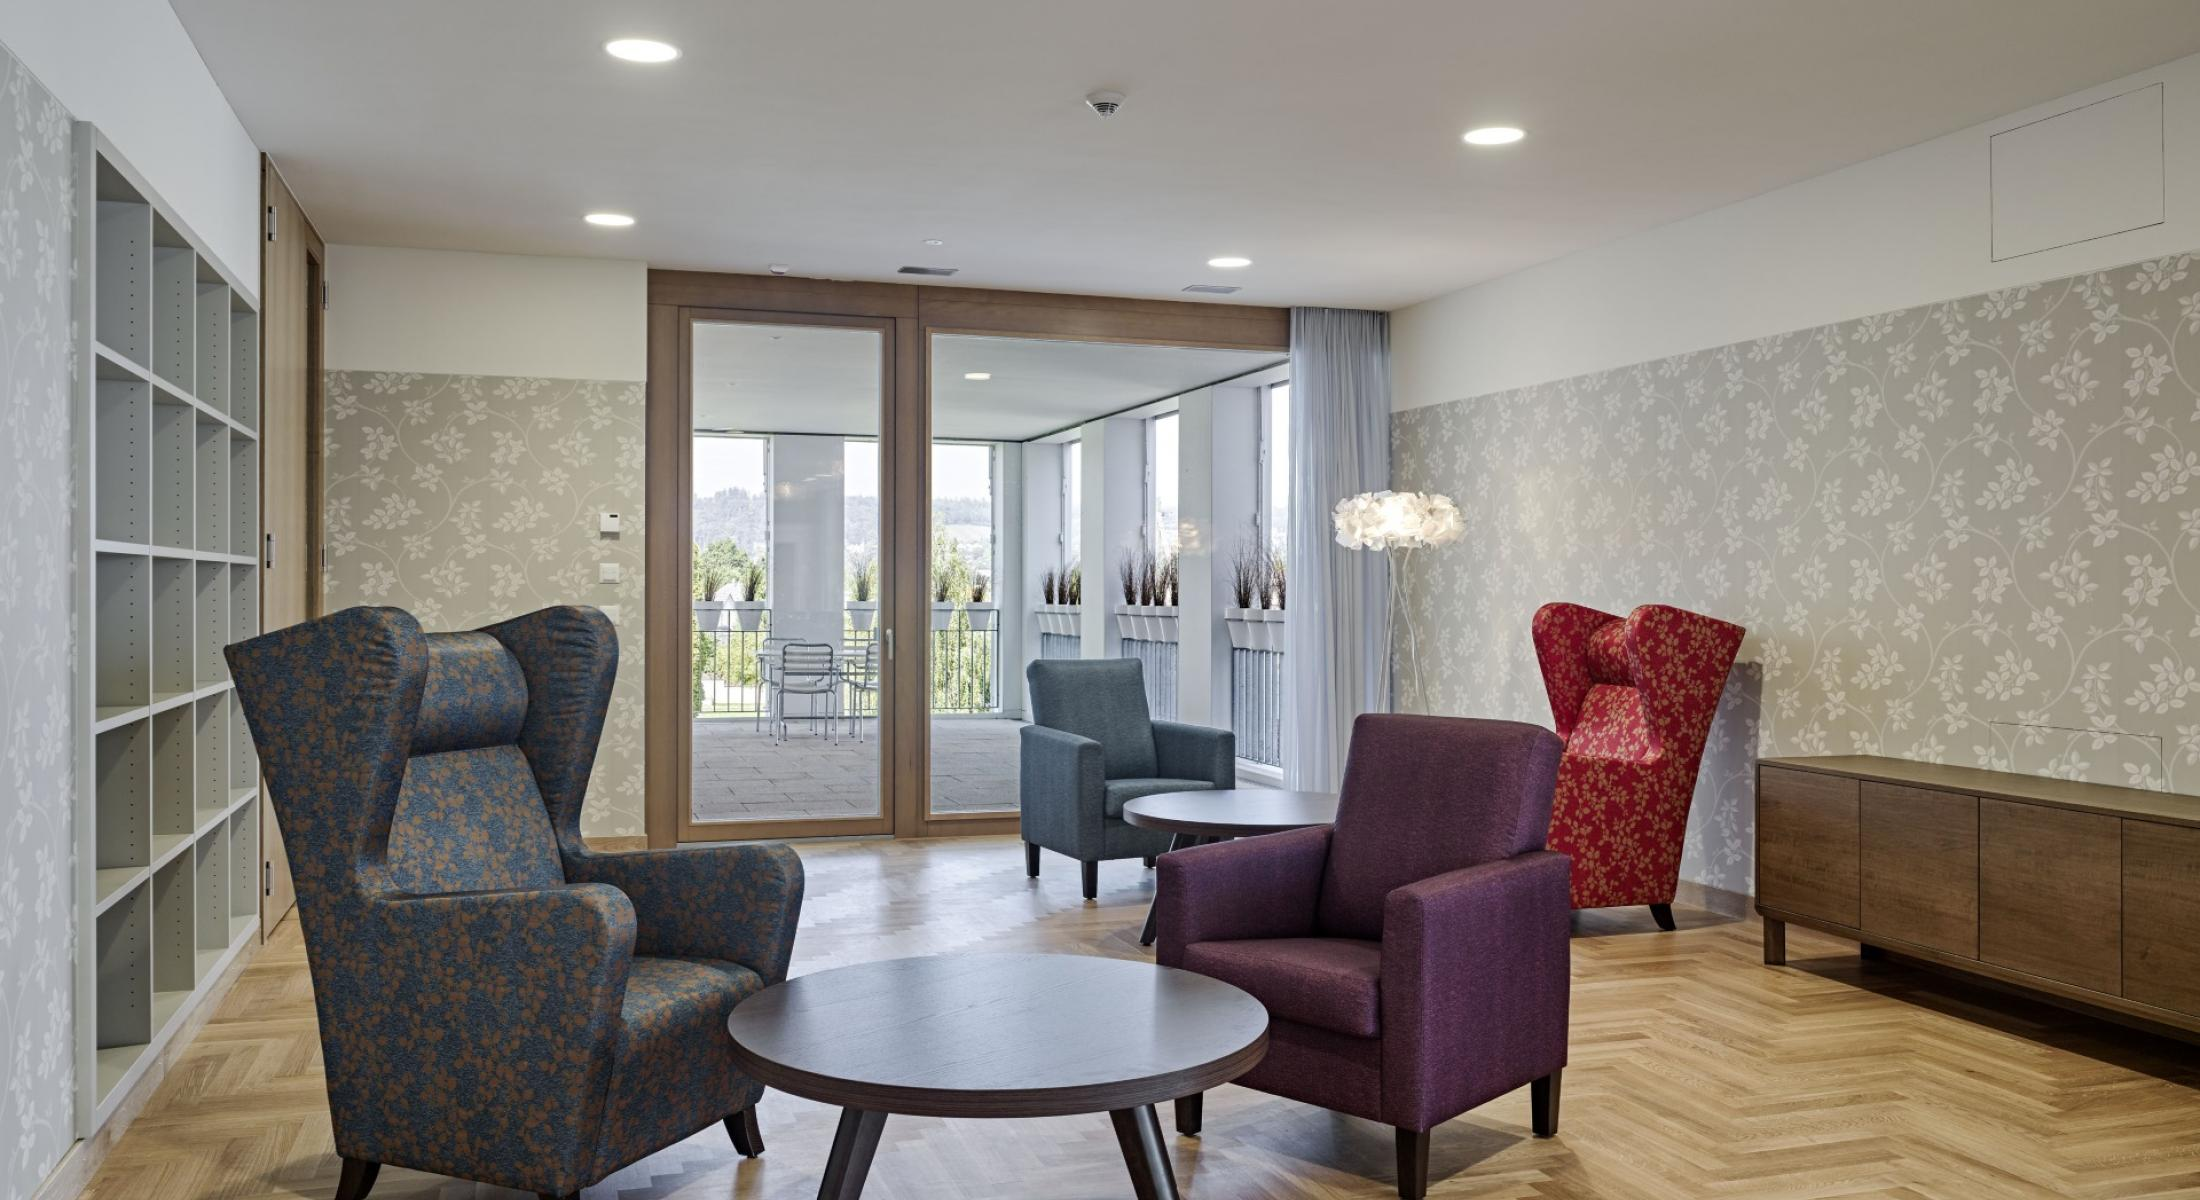 Creating Hospitality - Zentrum Kohlfirst 1 - Suisse _ LR_1